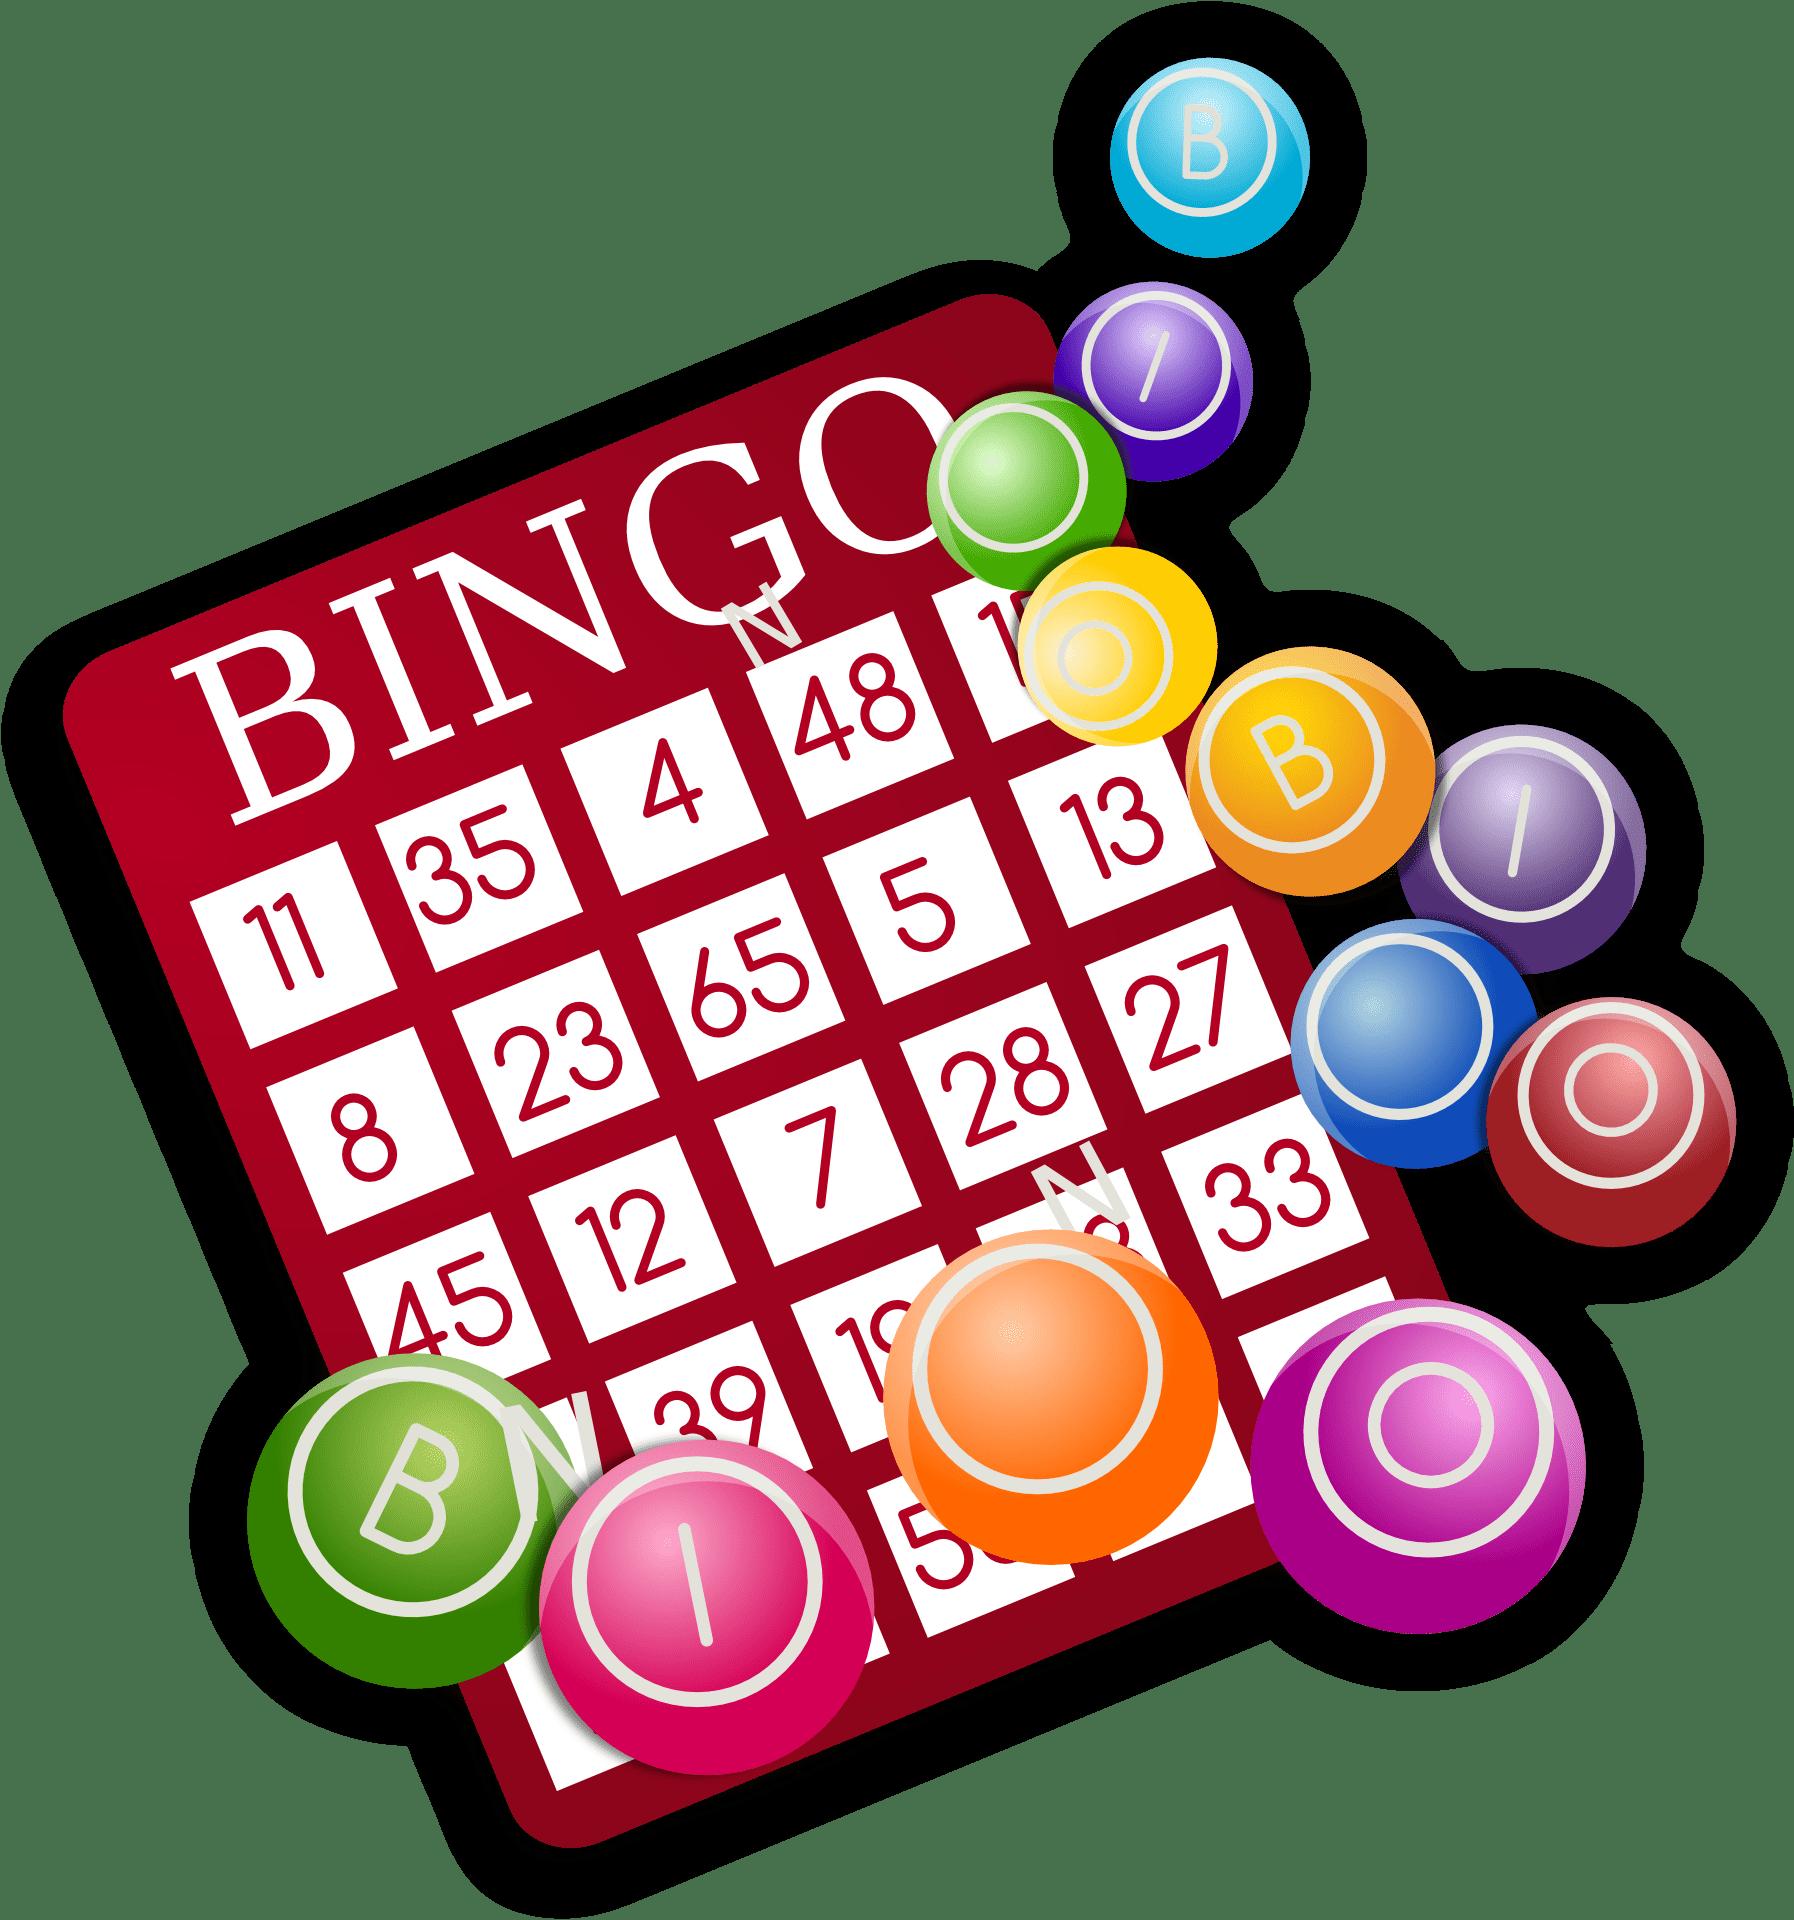 Bingo | OWSV Galathea Almelo